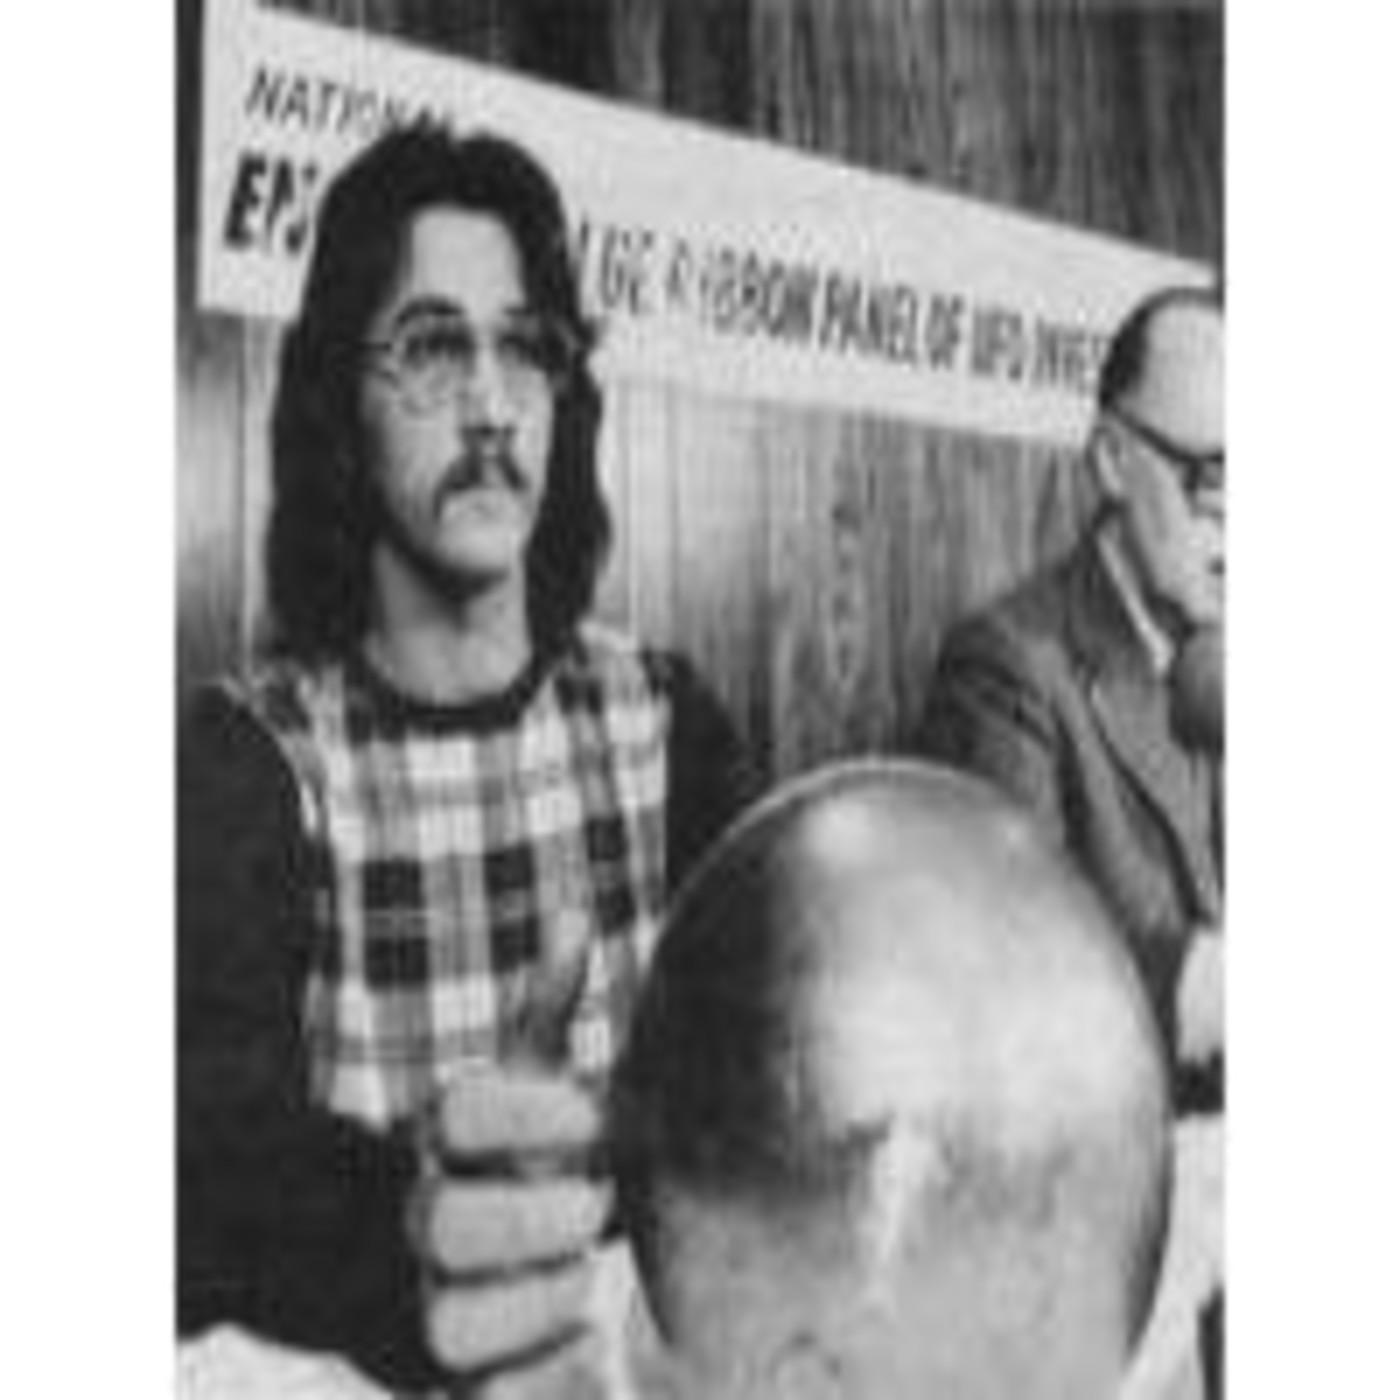 187 - La misteriosa esfera de los Betz